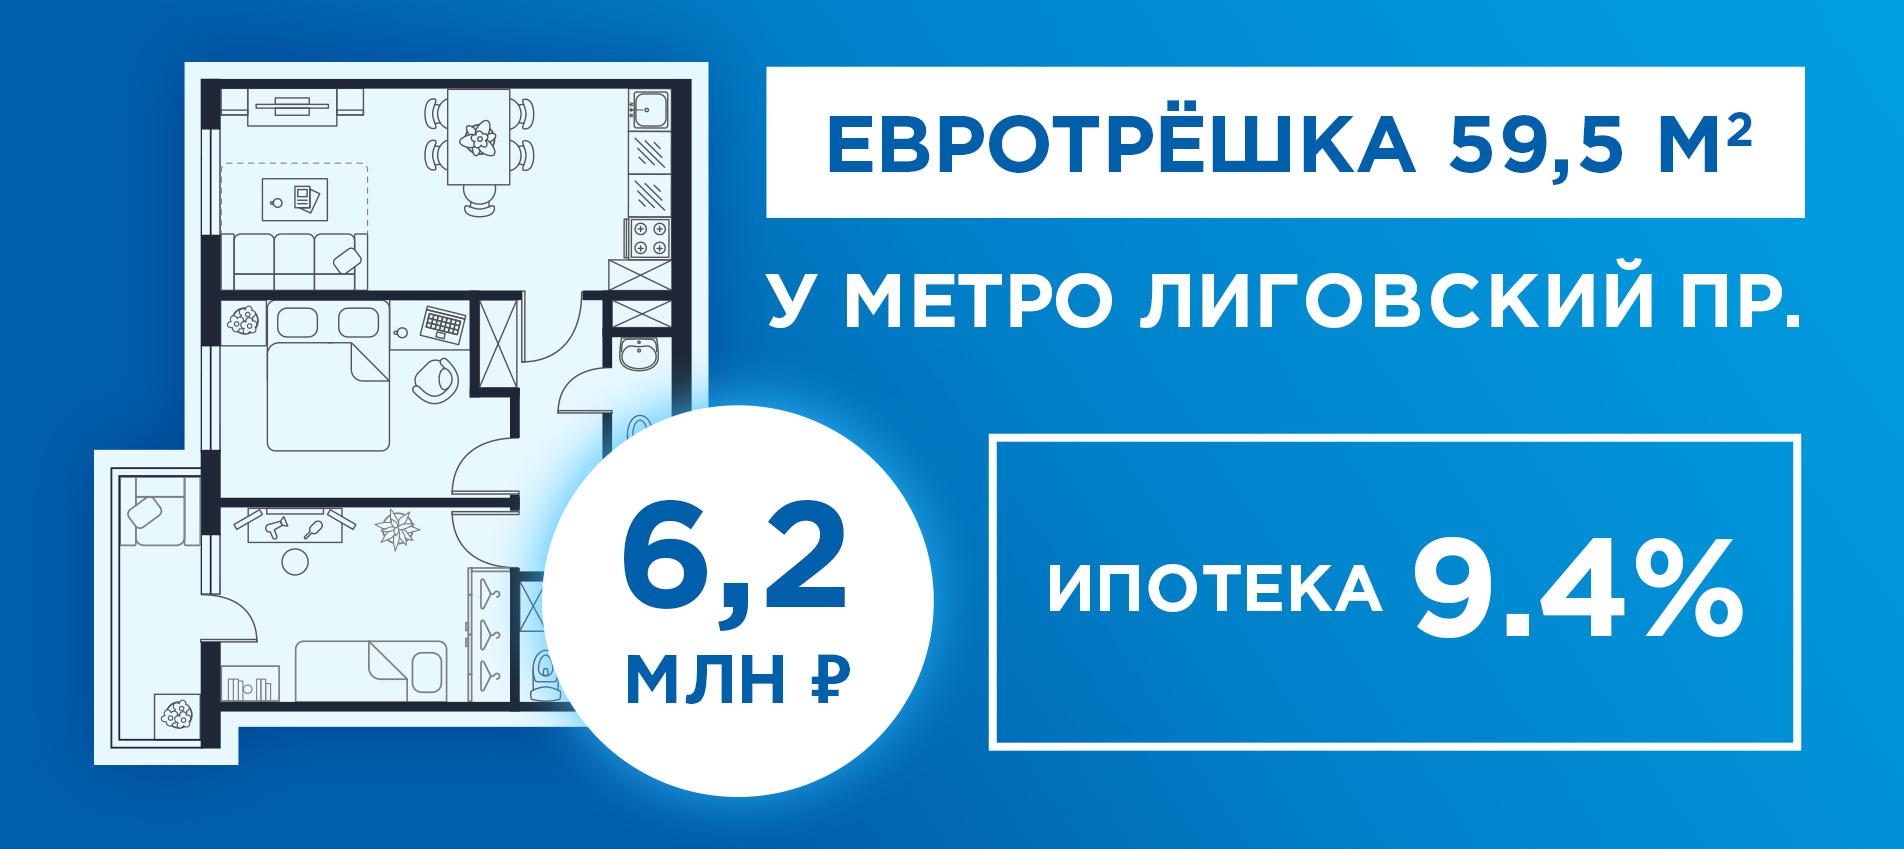 Евротрёшка 59.5 метро в центре Санкт-Петербурга за 6.2 миллиона рублей!